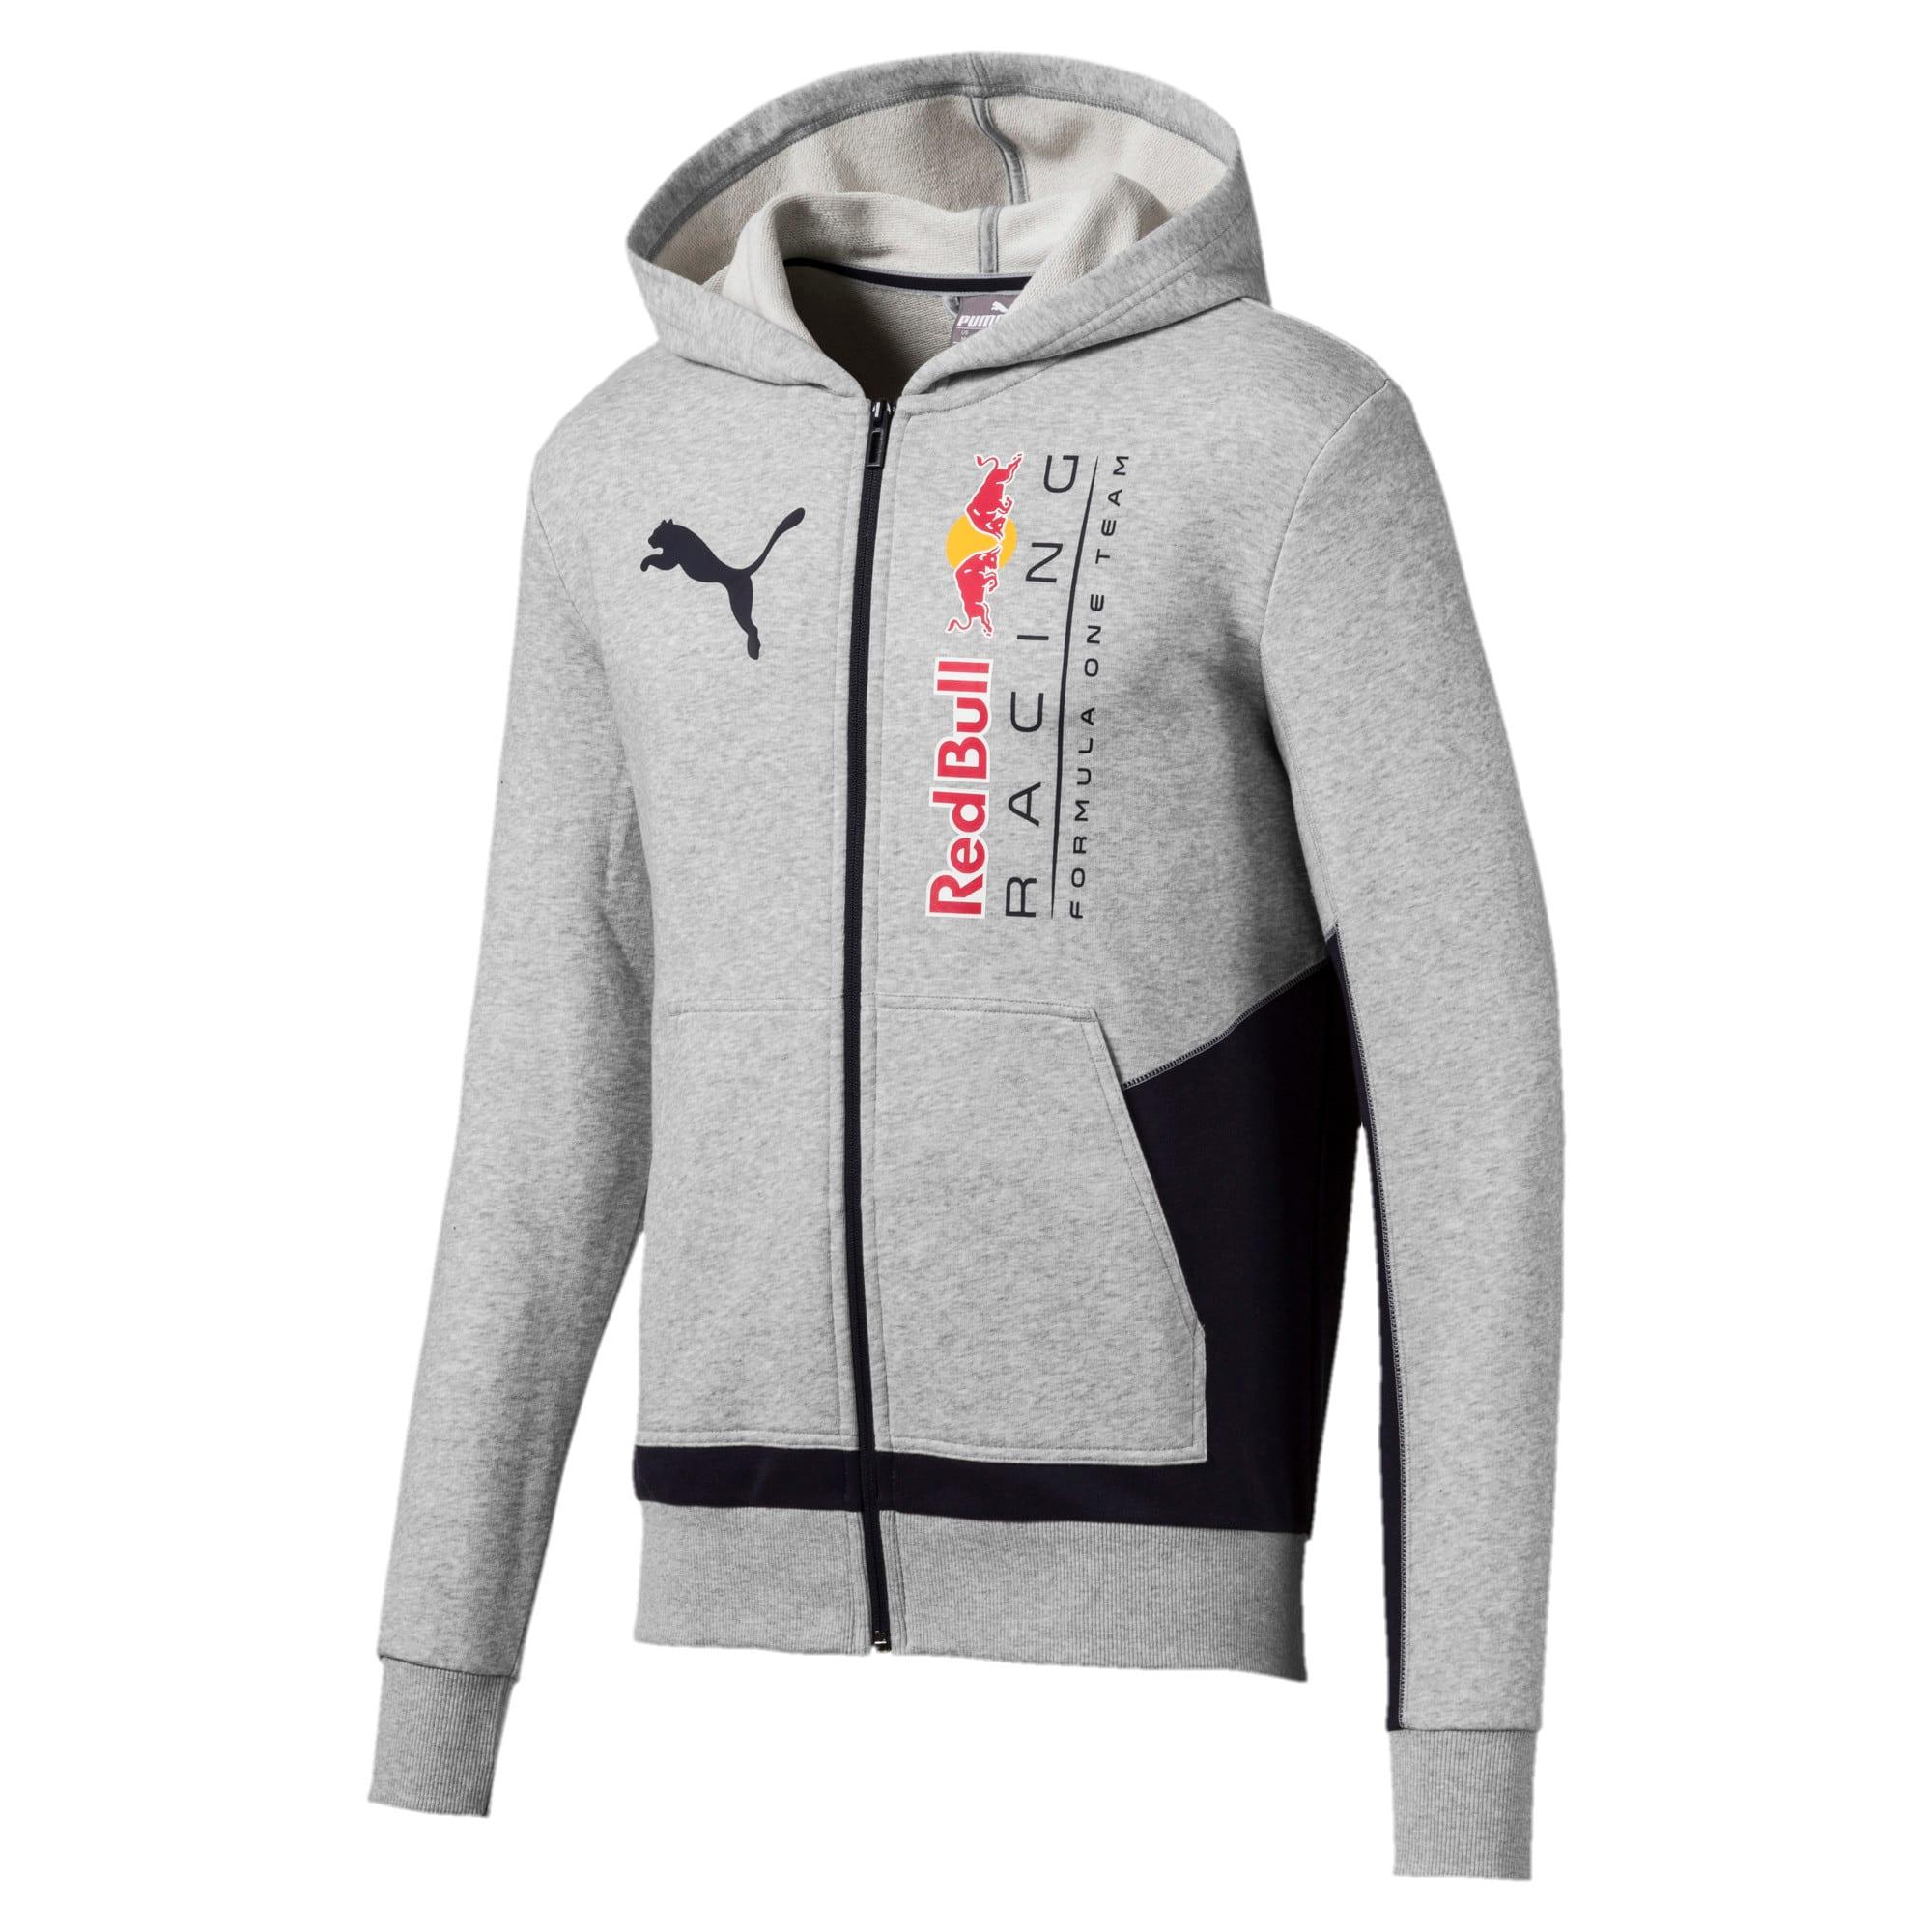 Thumbnail 5 of RBR Logo Hooded Men's Sweat Jacket, Light Gray Heather, medium